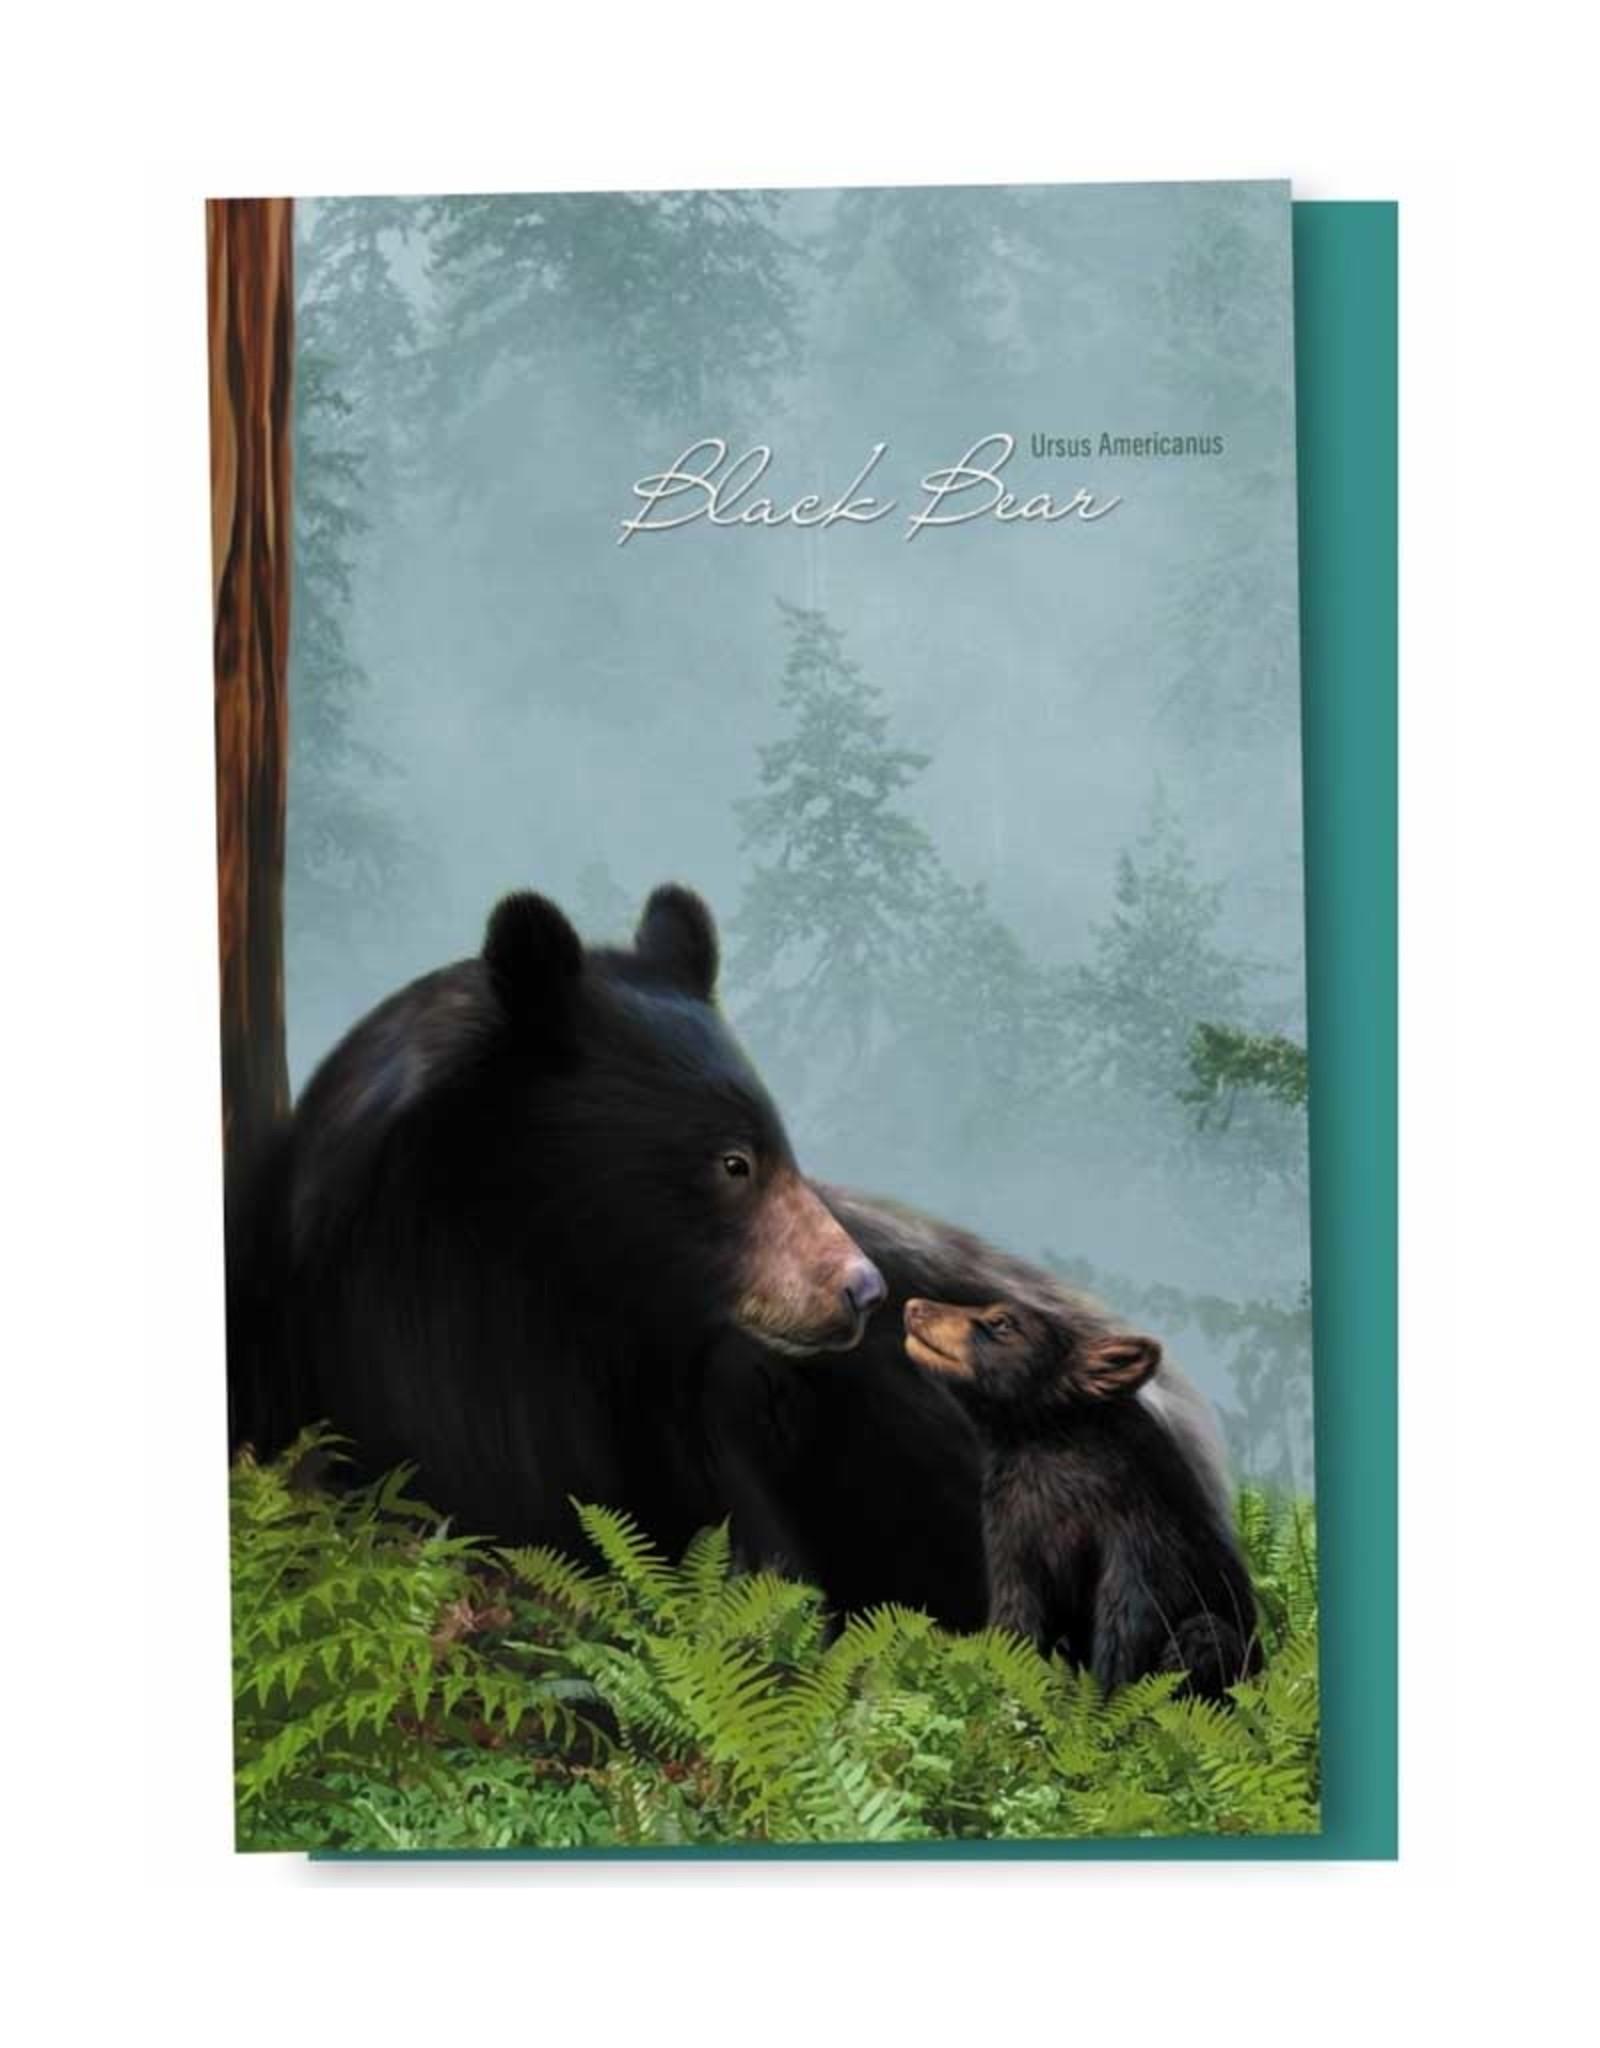 Tree - Free Greetings Black Bear Family  - 12 Notecards